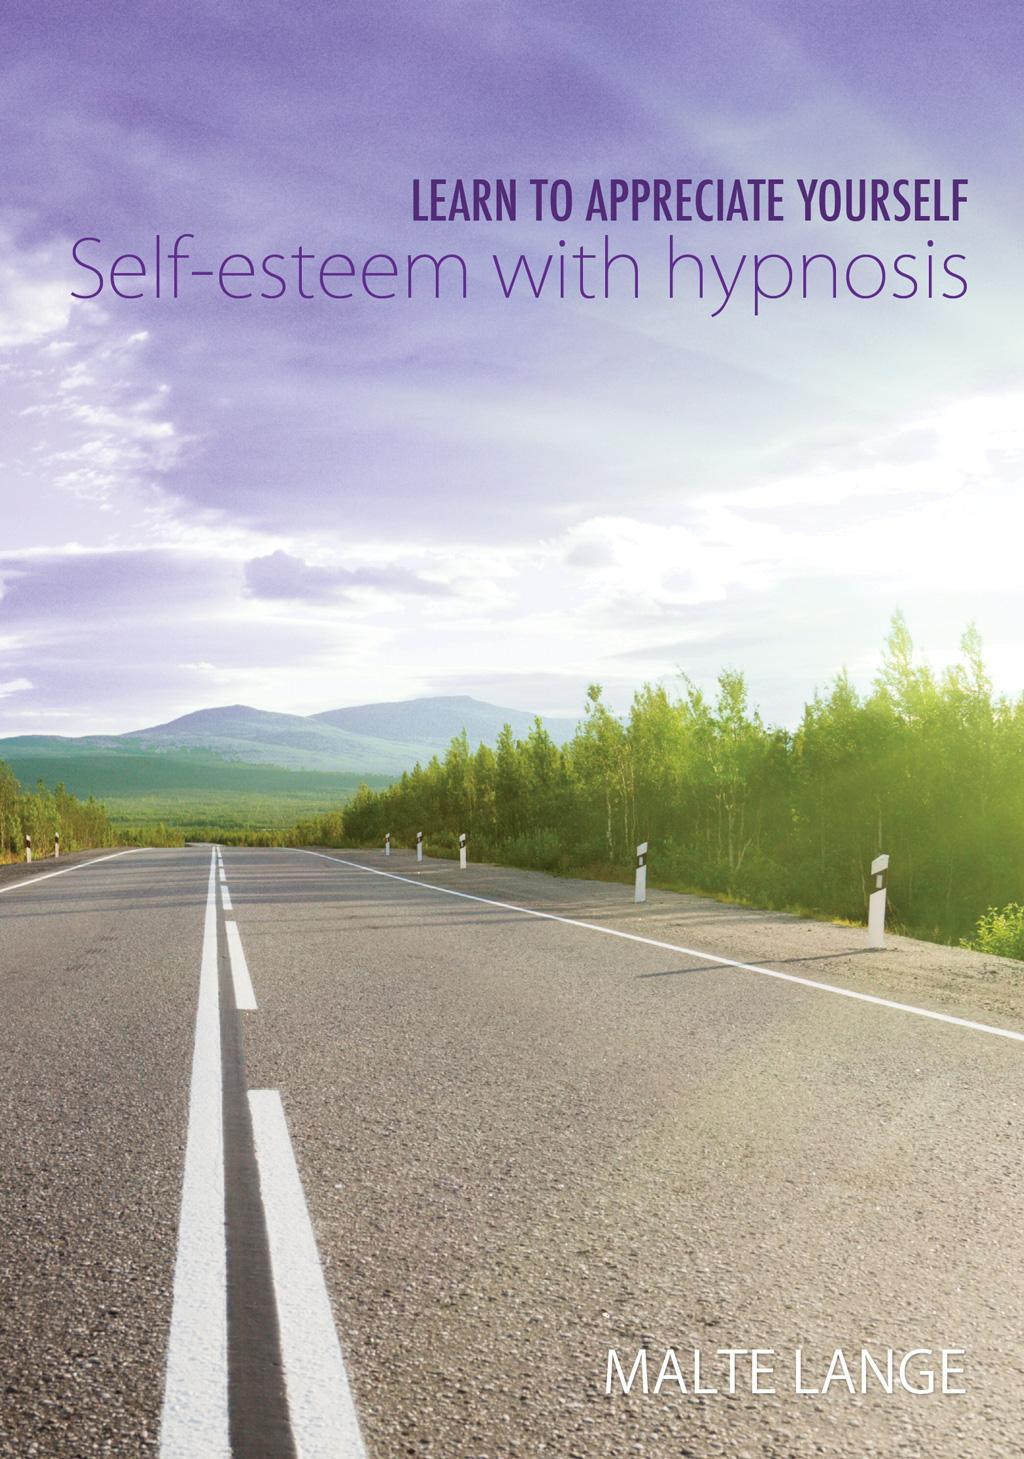 how to build self esteem in yourself